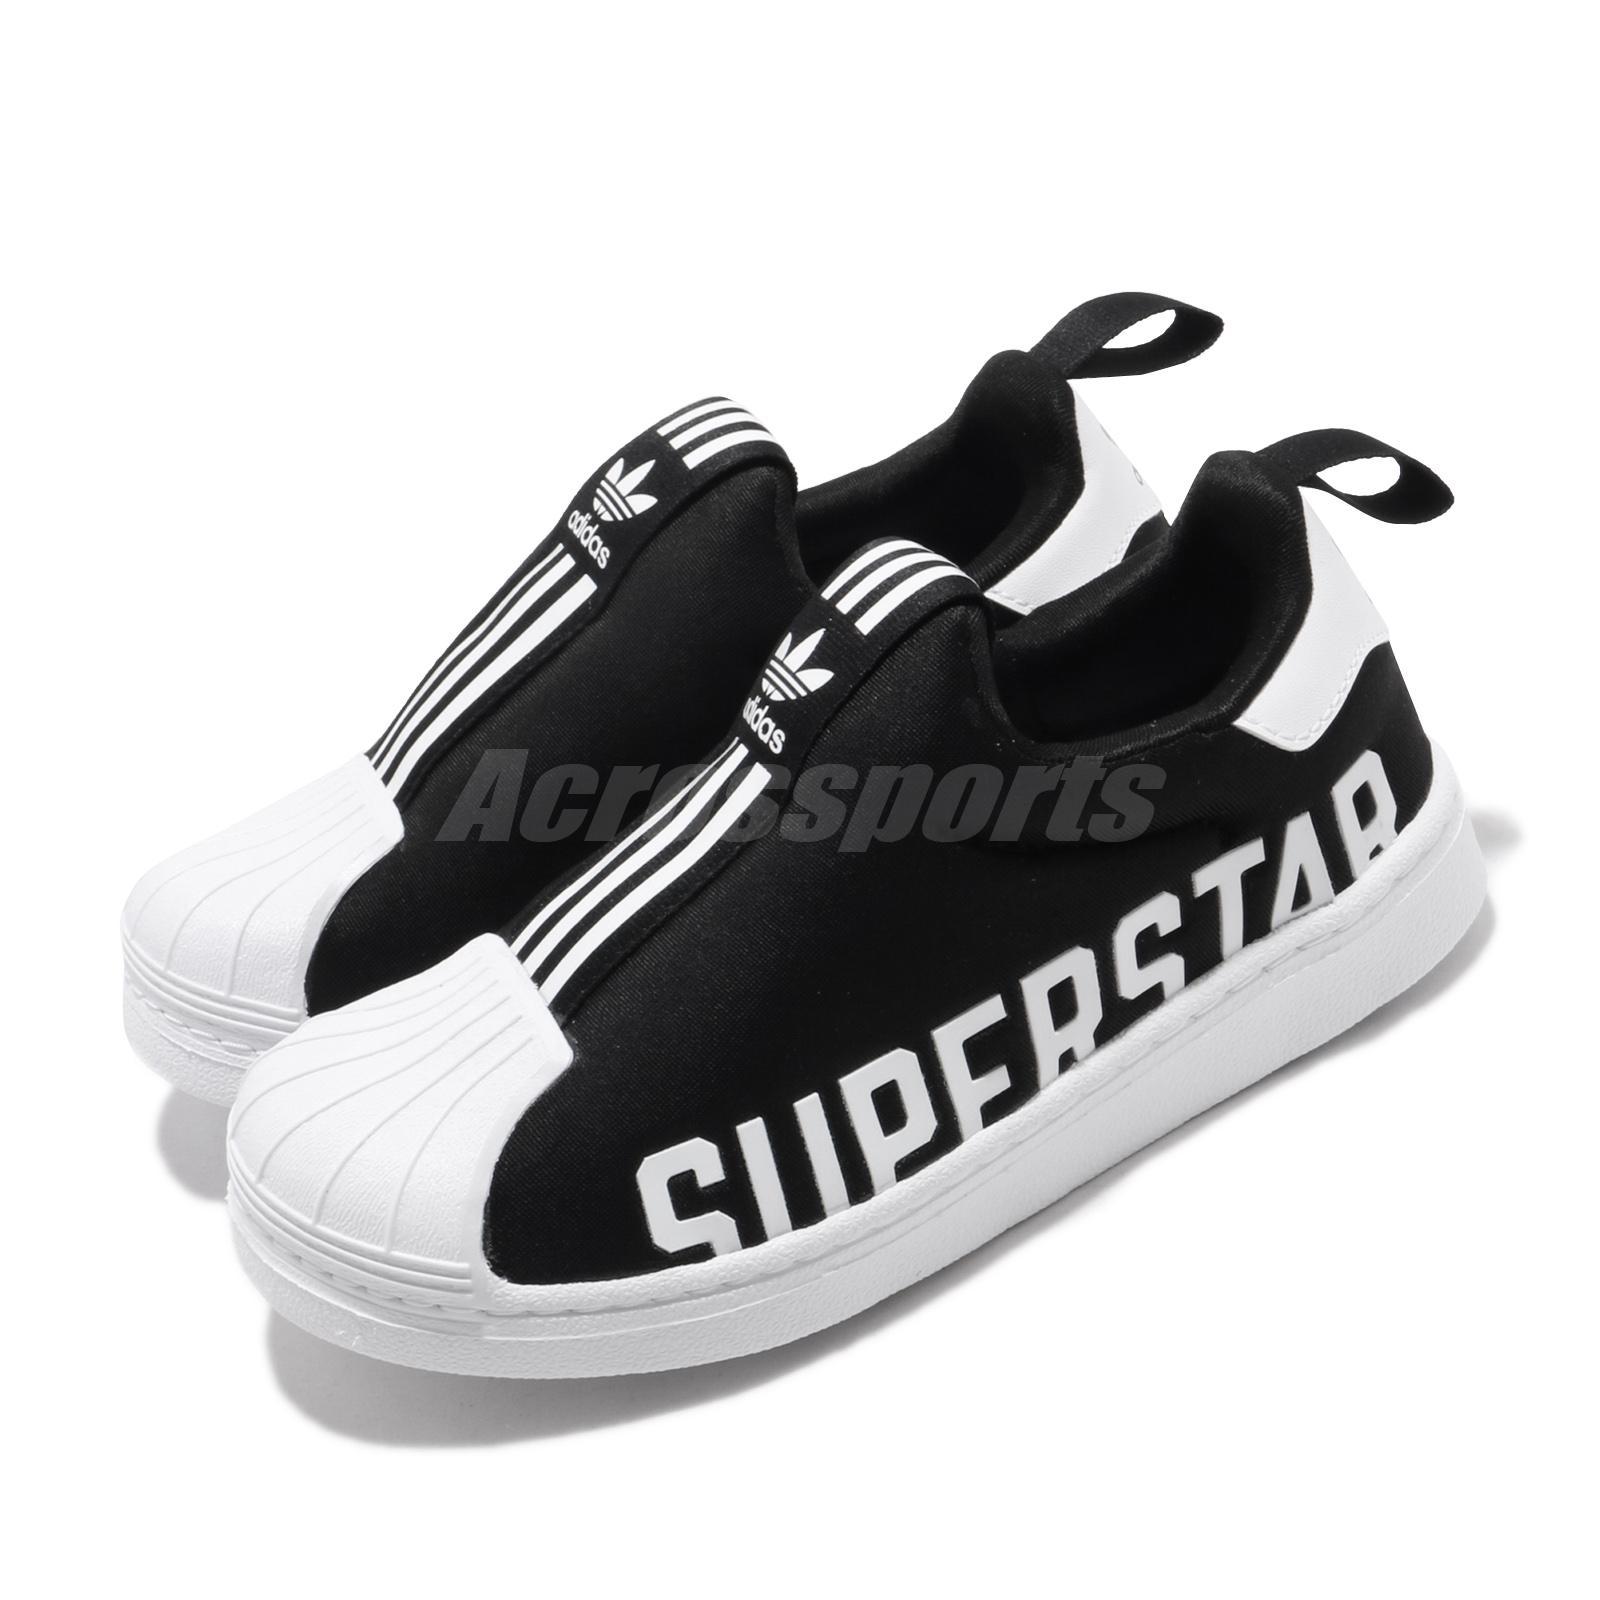 adidas Originals Superstar 360 X C